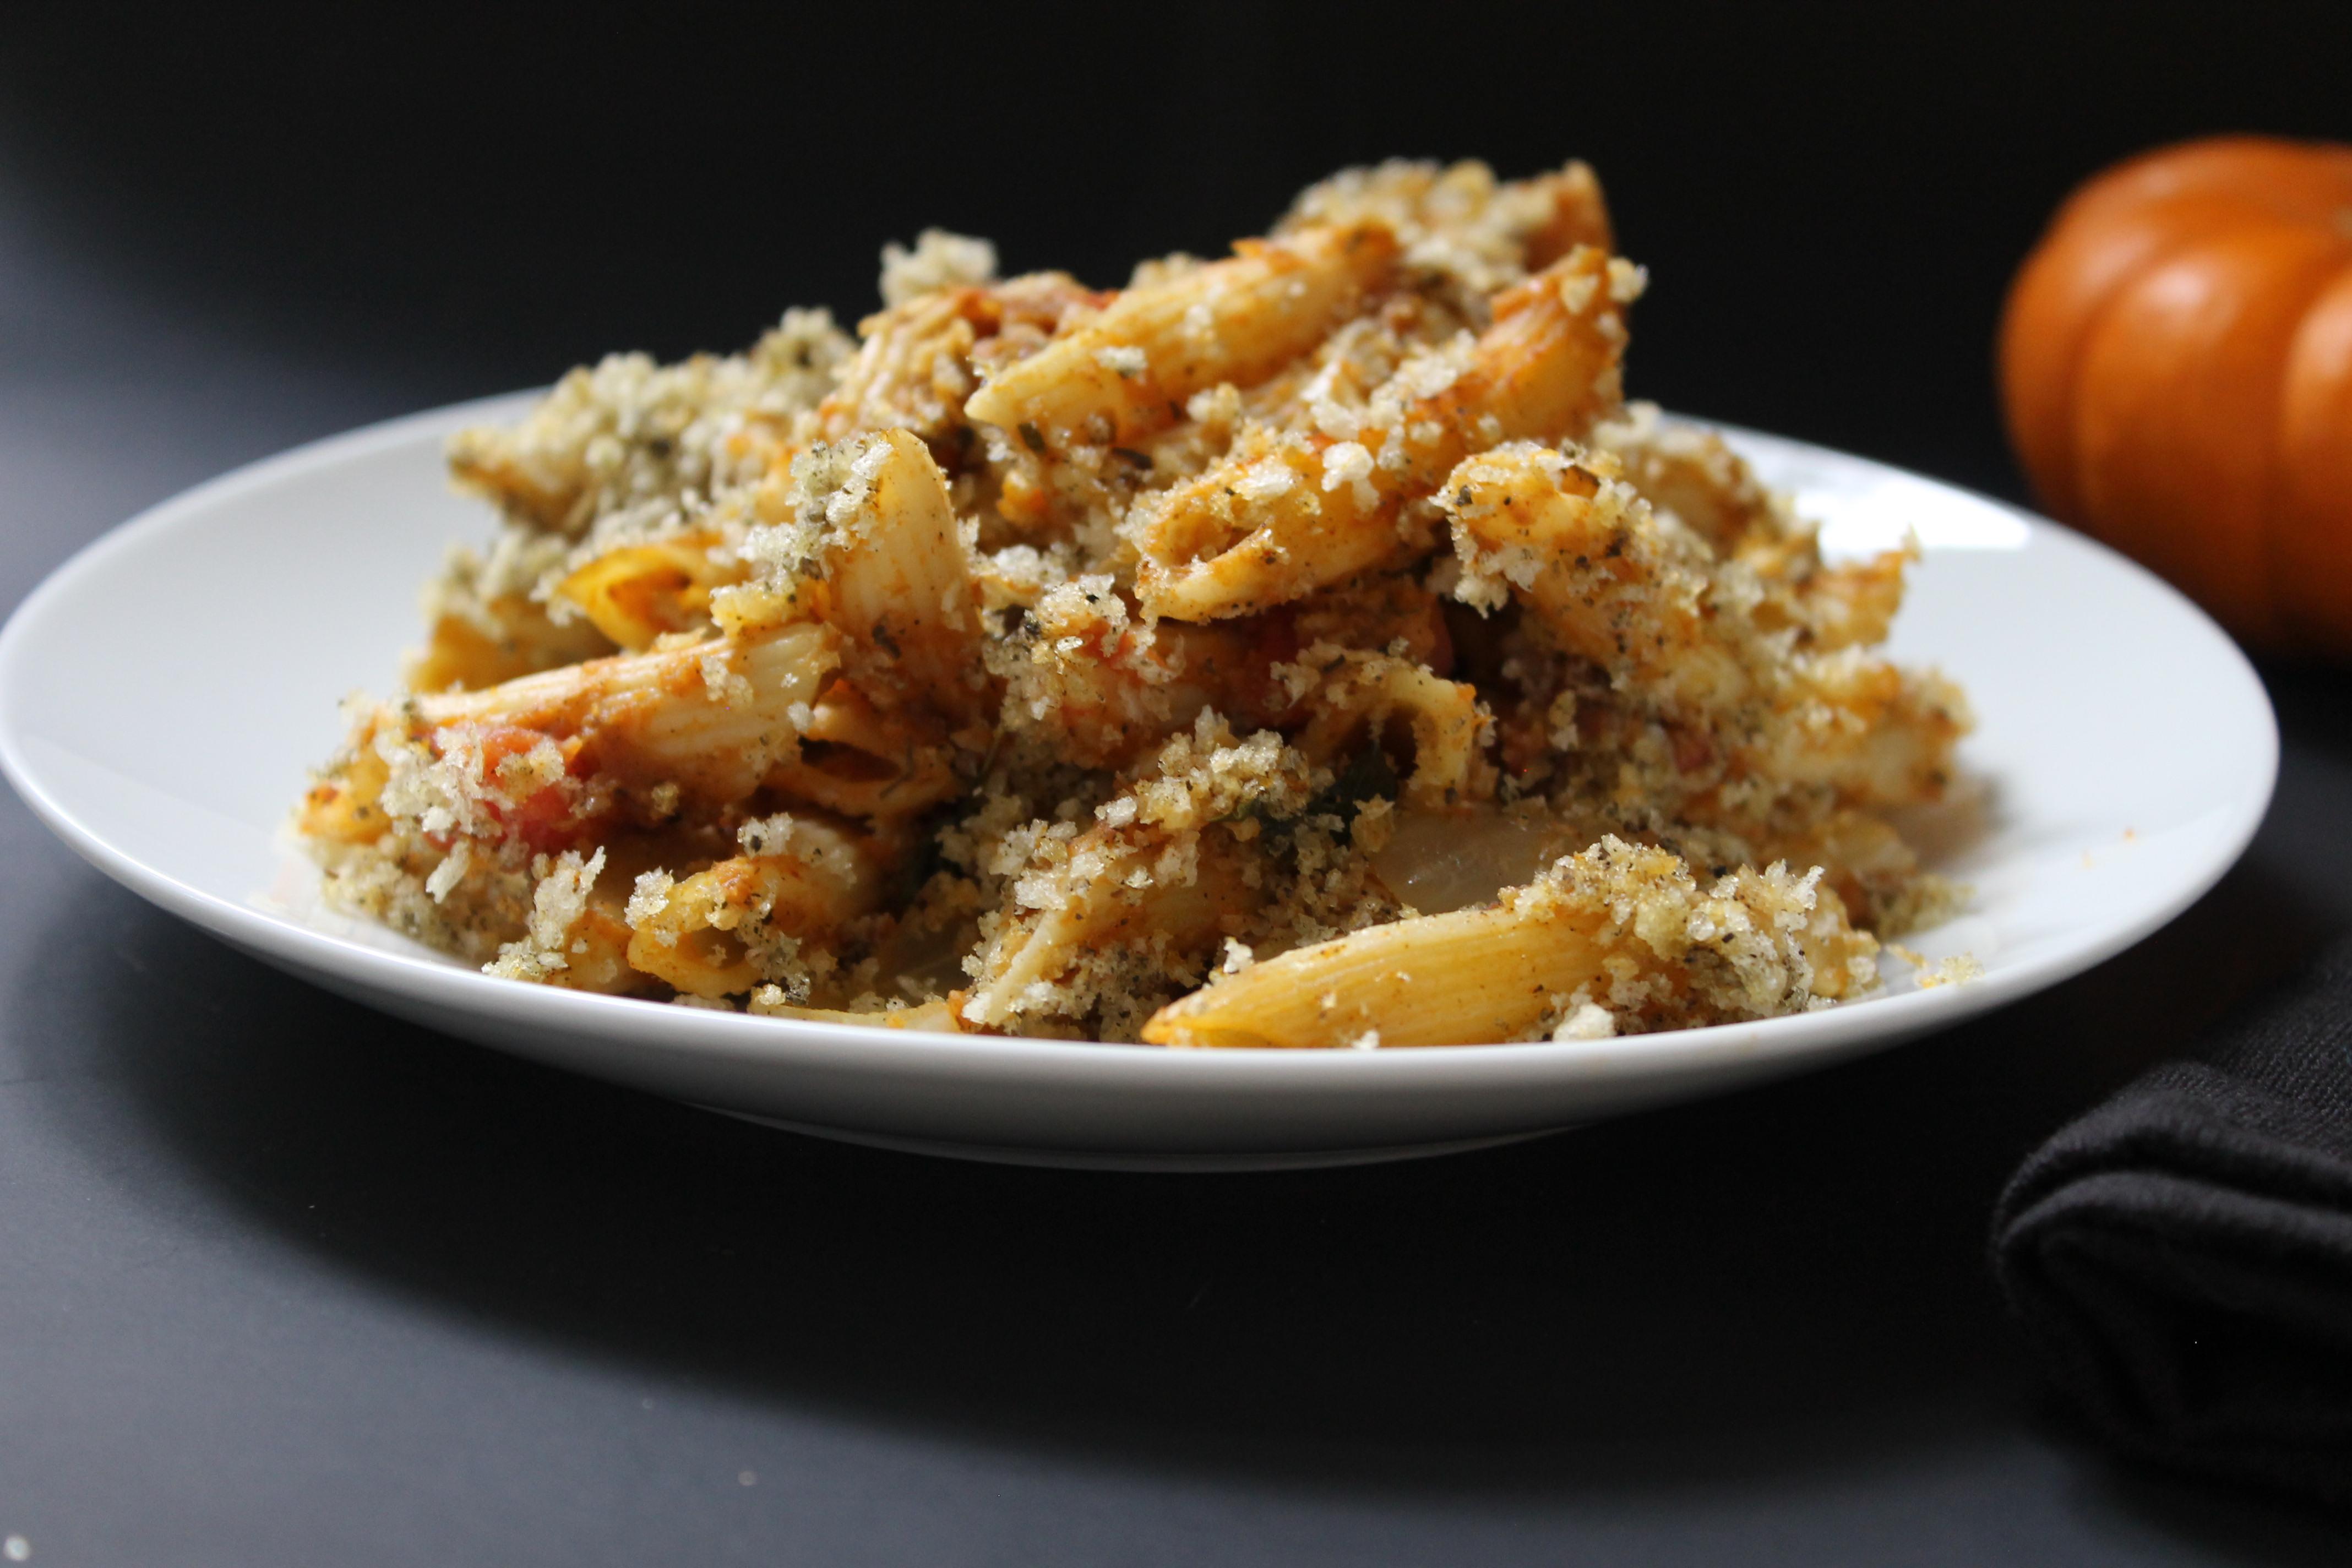 YUMMY!!! Vegan Baked Pumpkin Pasta! #vegan #plantbased #dinner #pasta #recipe #food